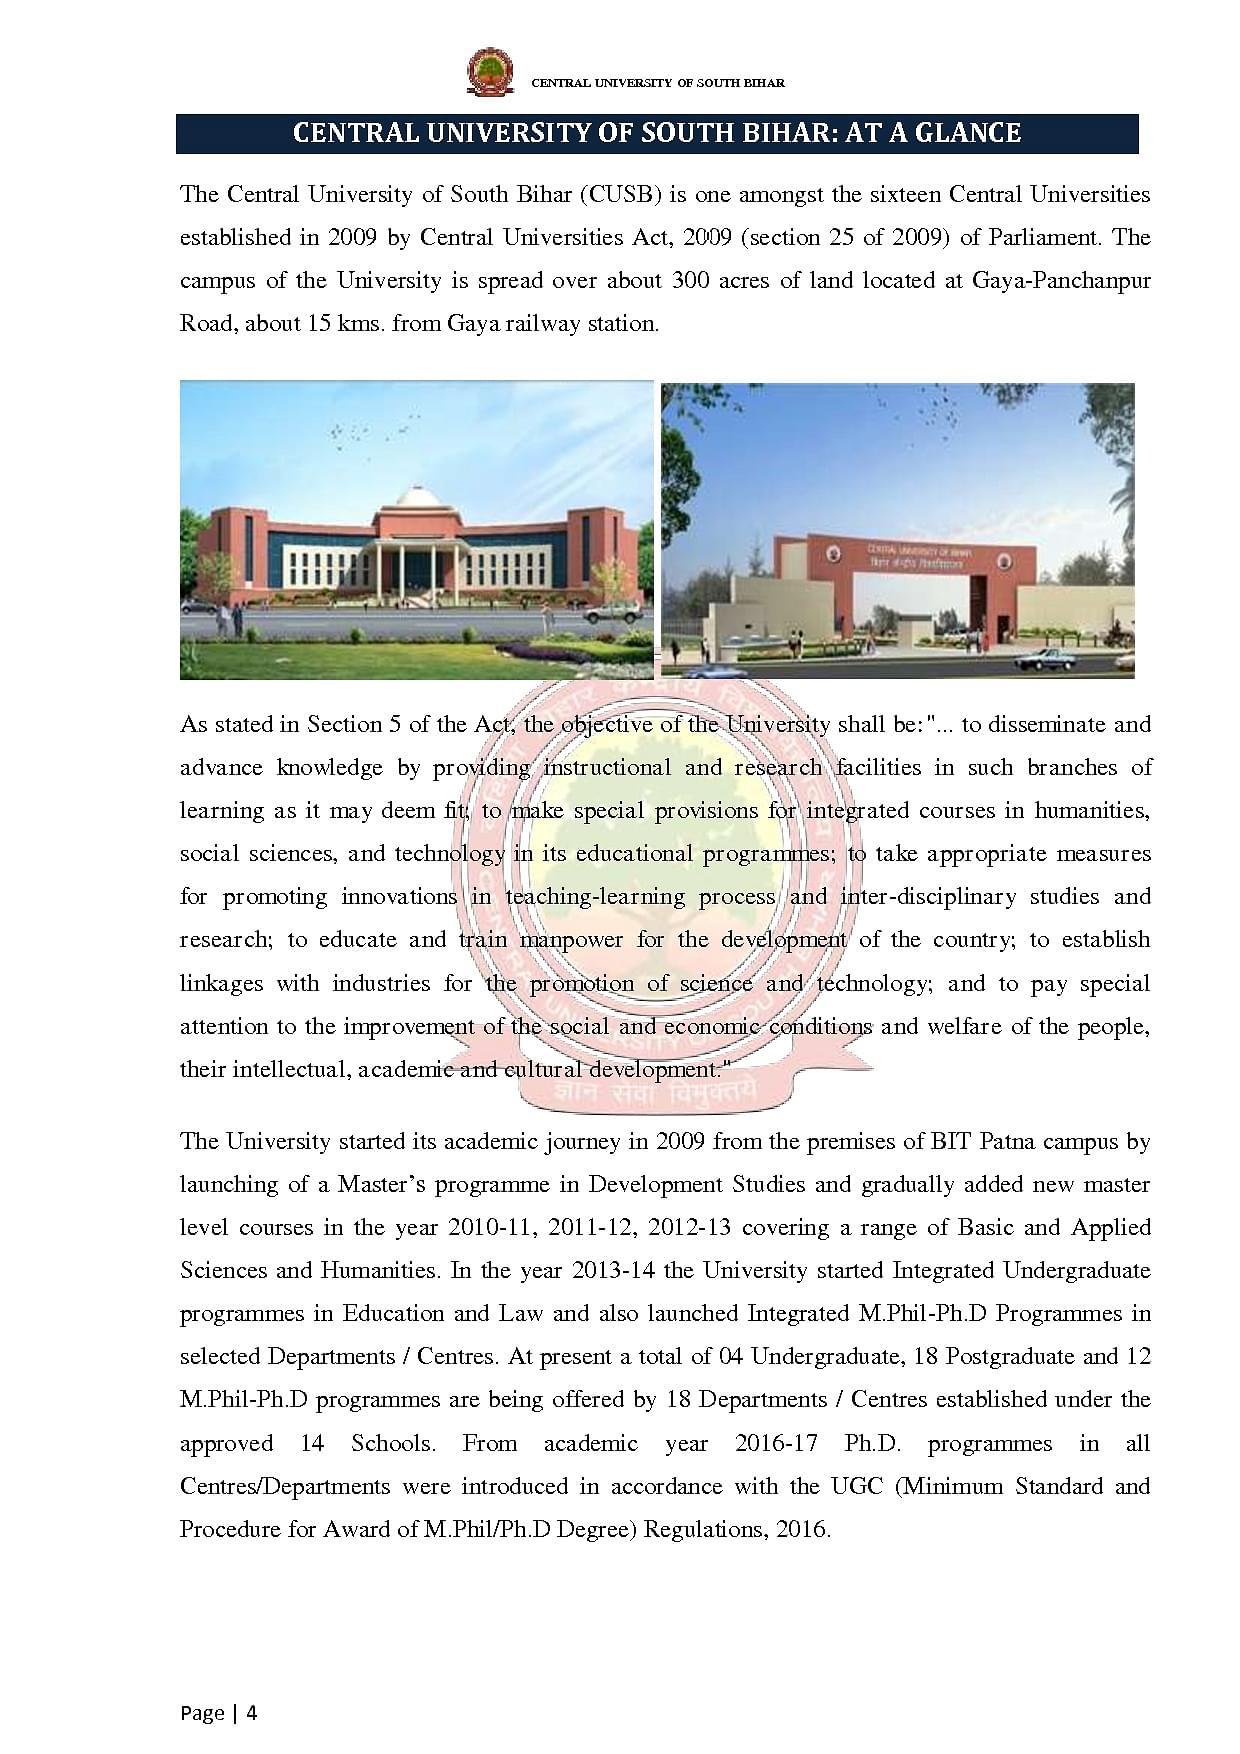 Central University of South Bihar - [CUSB], Gaya